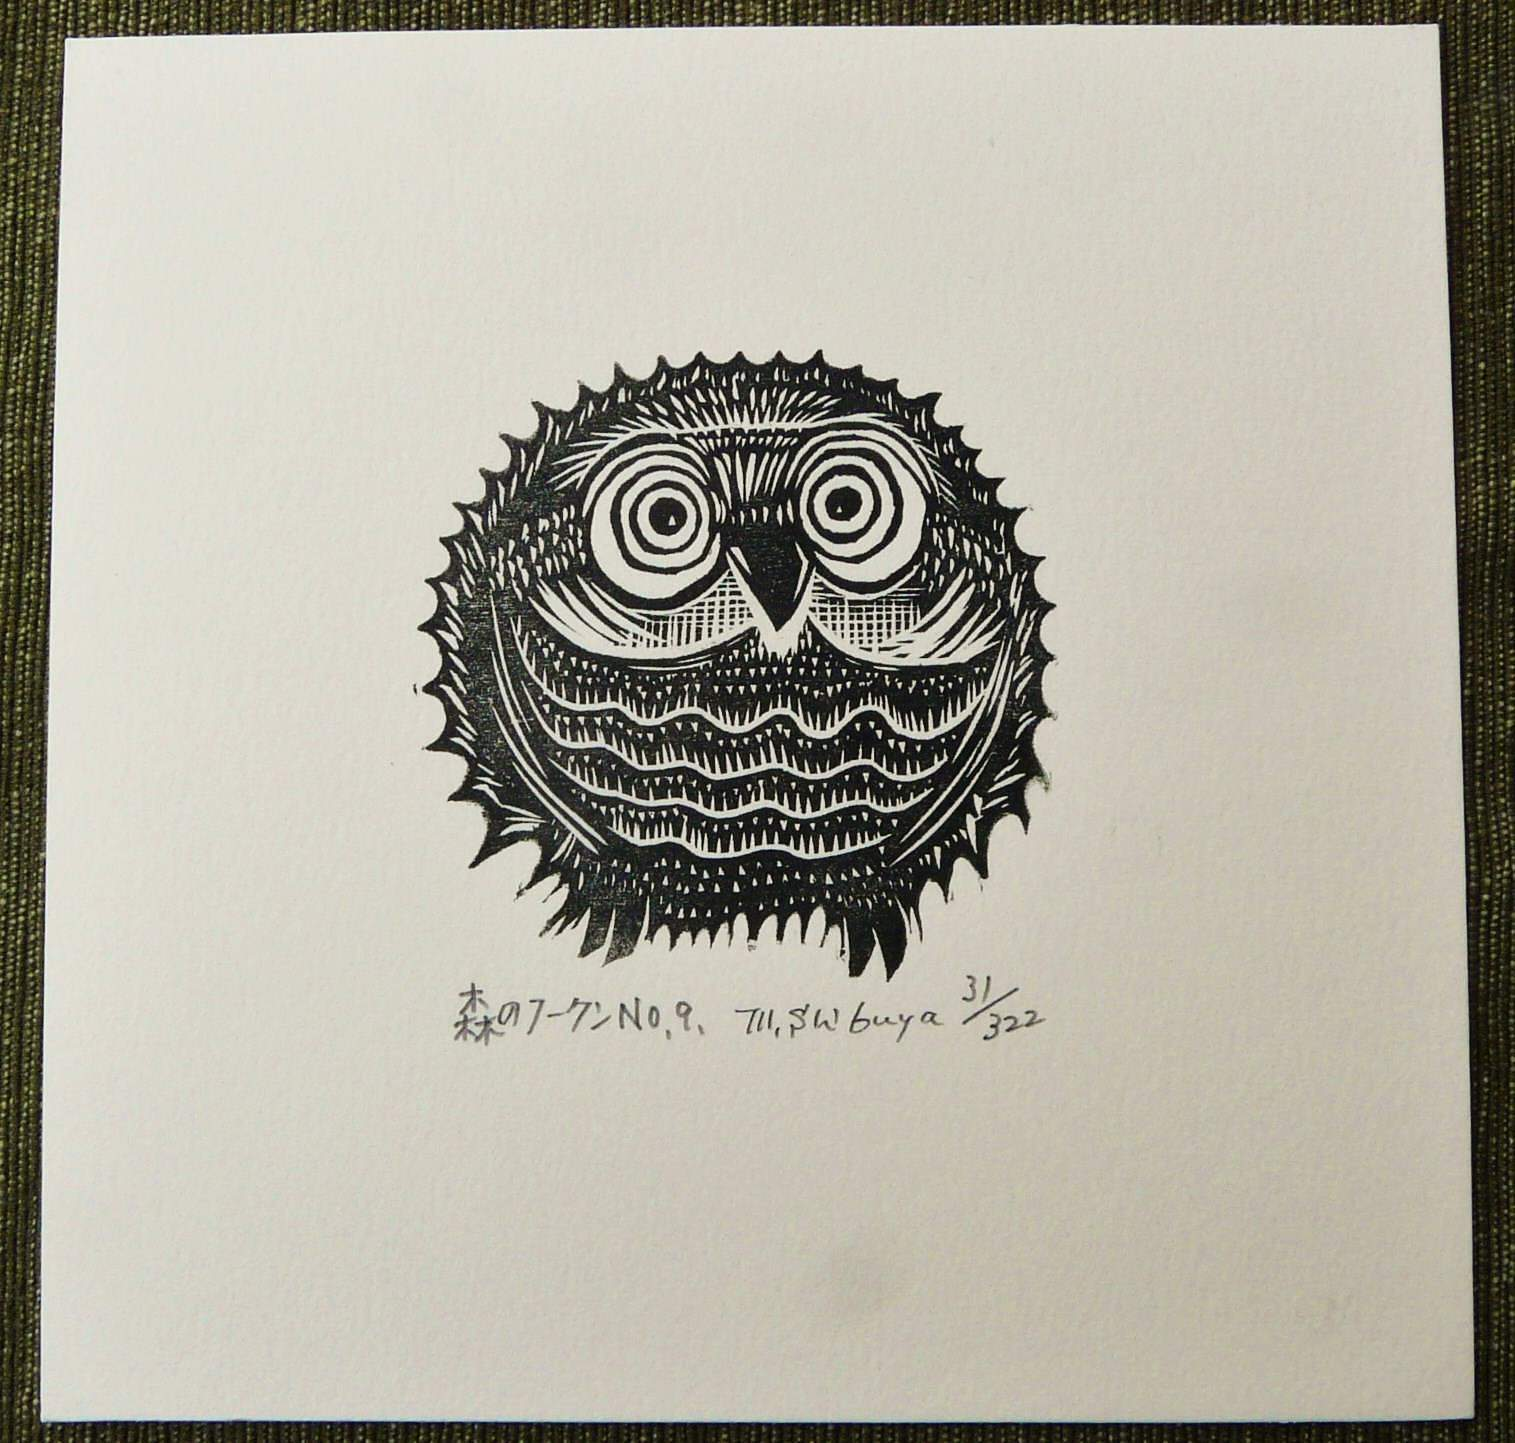 #P4282 FOREST OWL By MASAKI SHIBUYA